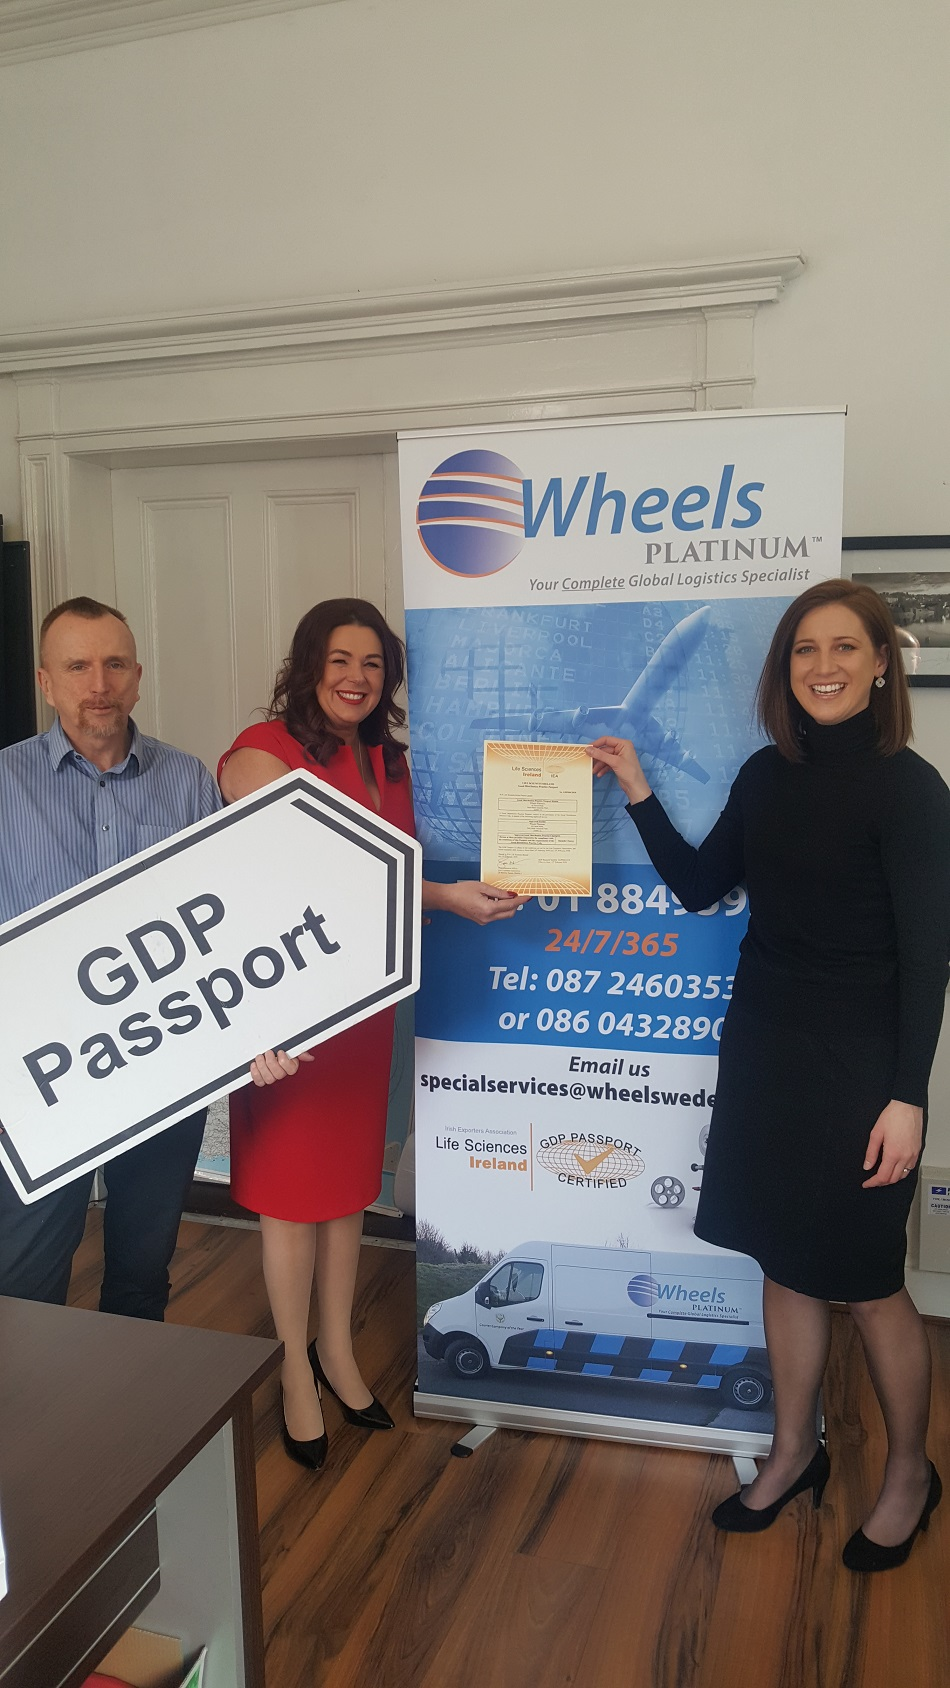 Wheels Platinum awarded GDP Passport accreditation